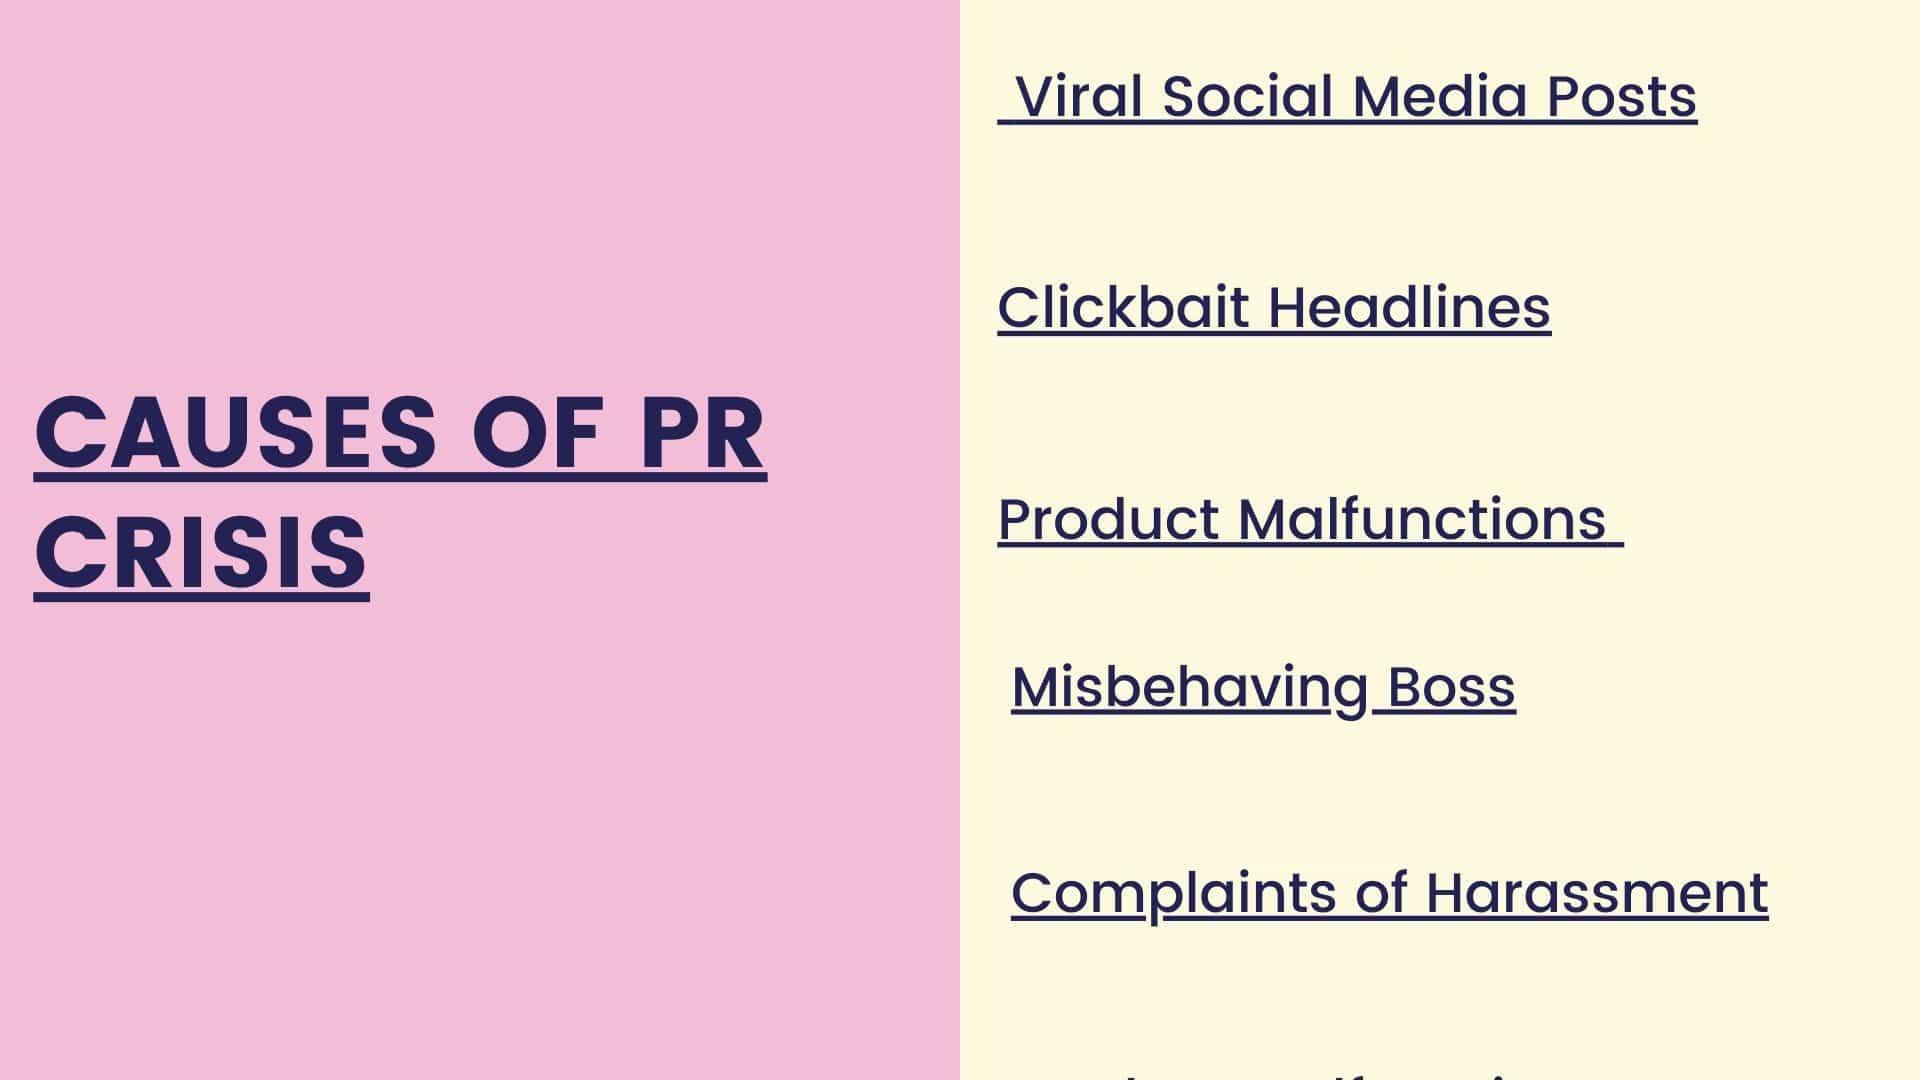 Causes of PR Crisis